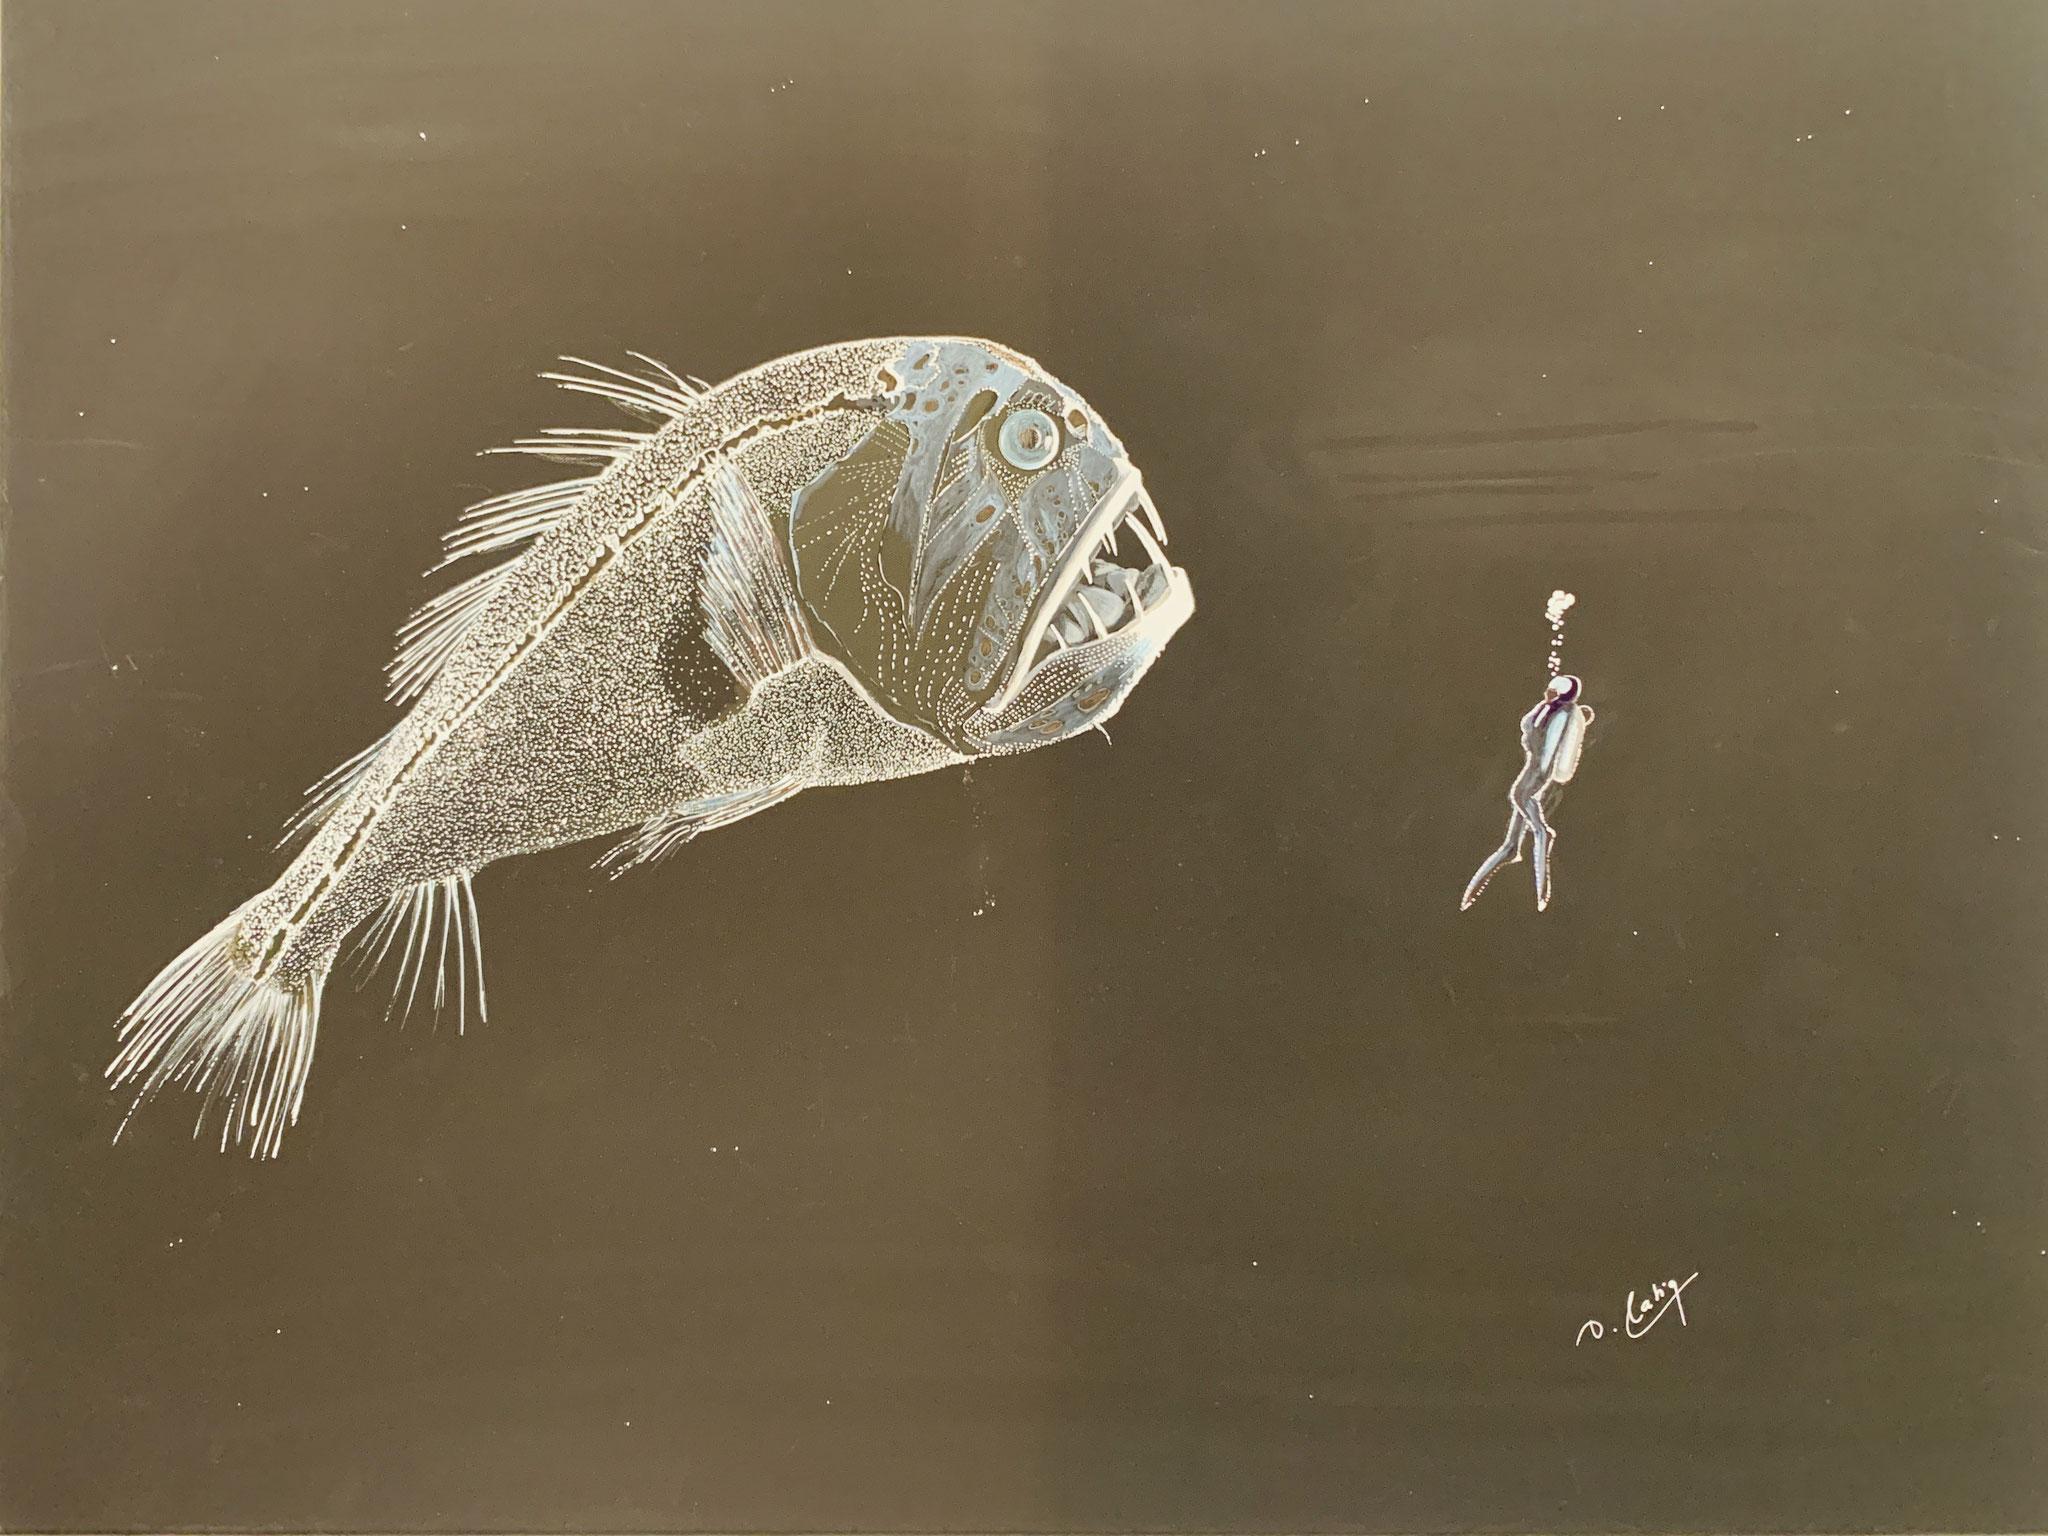 Detlef Hartig, Eines Tages im Pazifik, Acryl auf Leinwand, 2020, 1.800 €